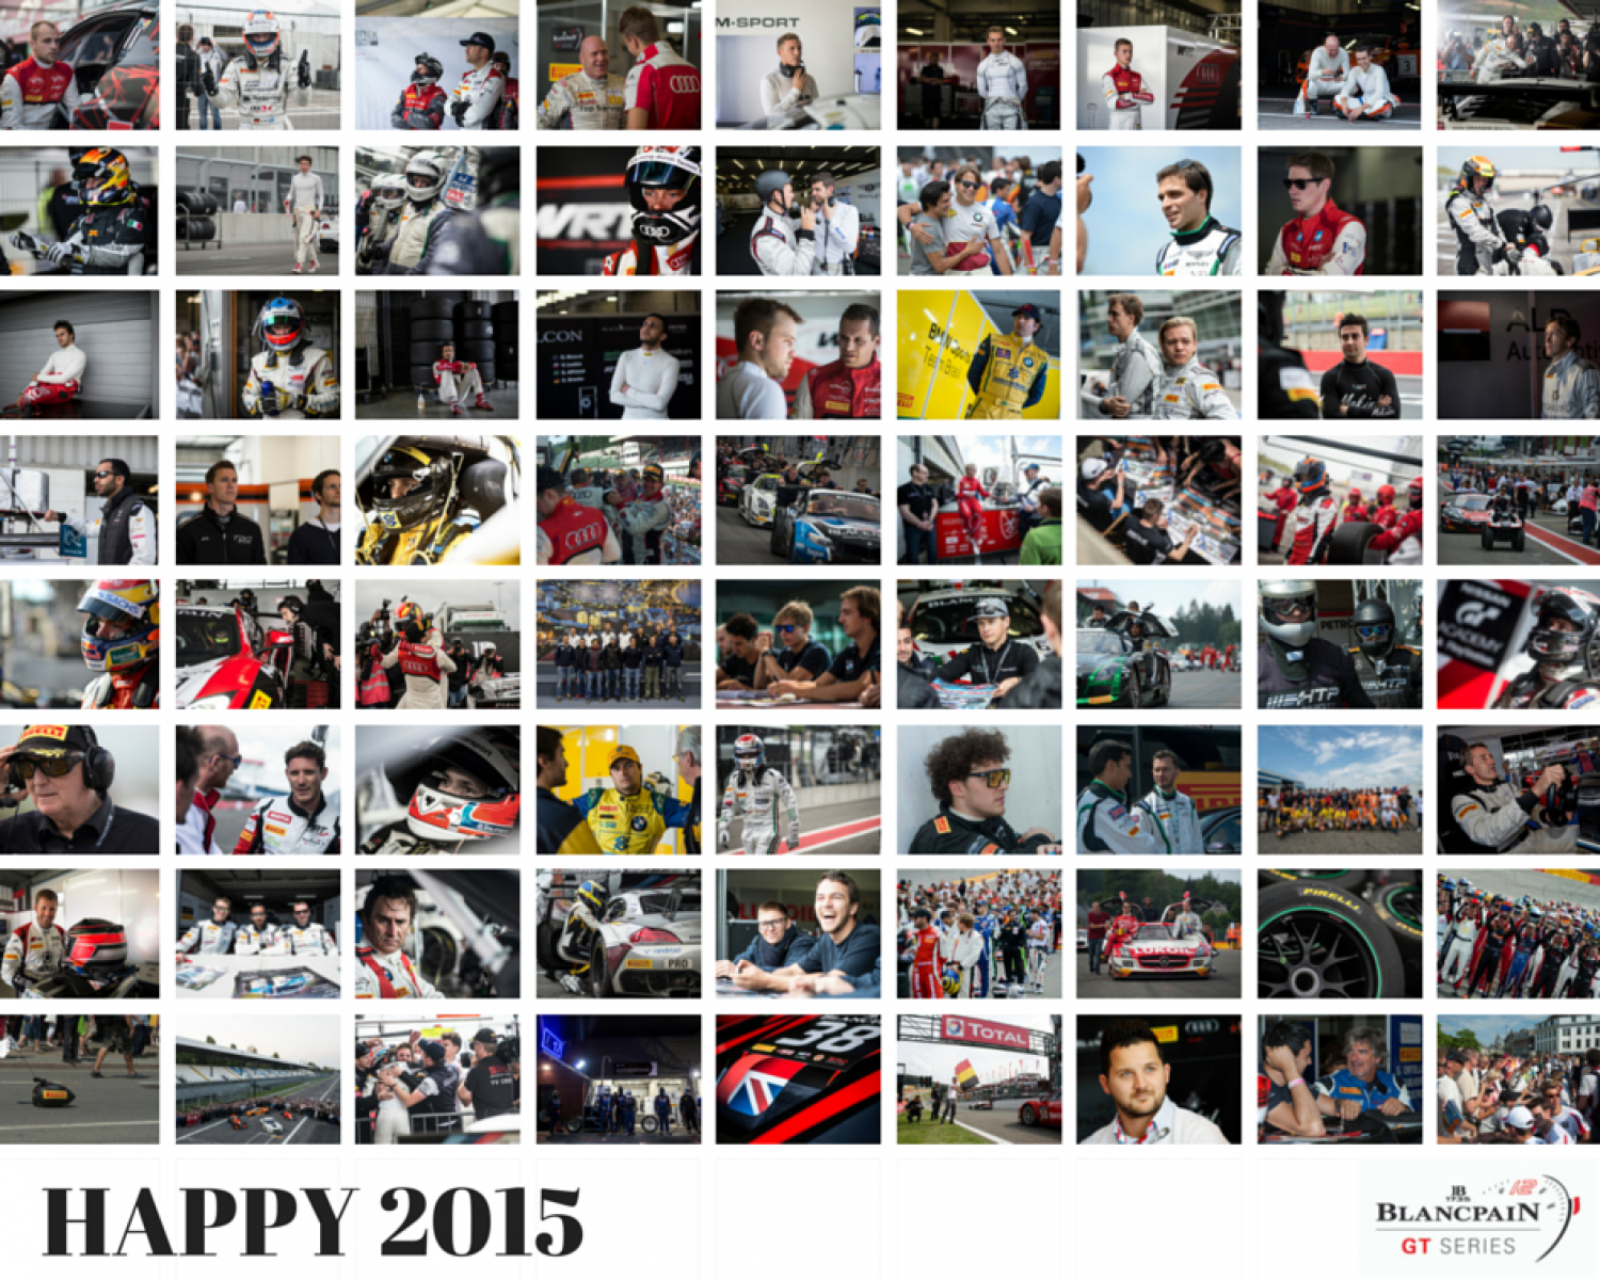 We wish you a wonderful 2015